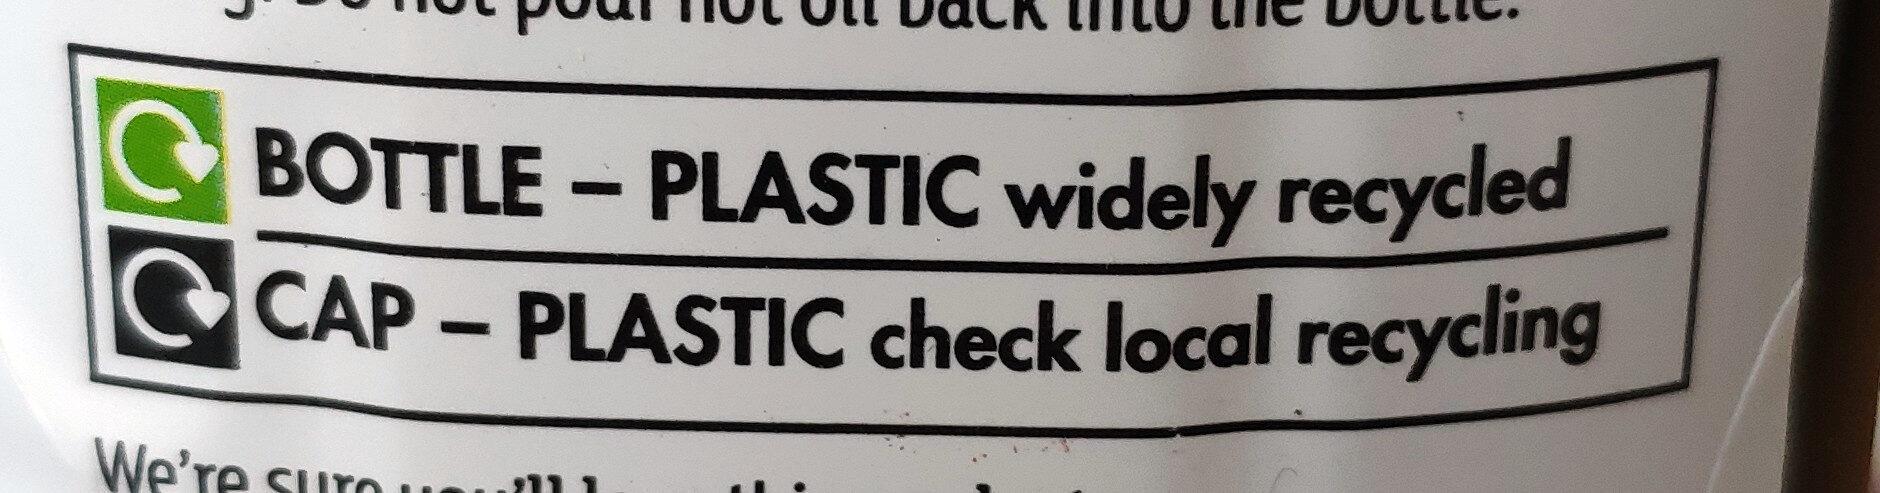 Extra virgin olive oil - Instruction de recyclage et/ou informations d'emballage - en